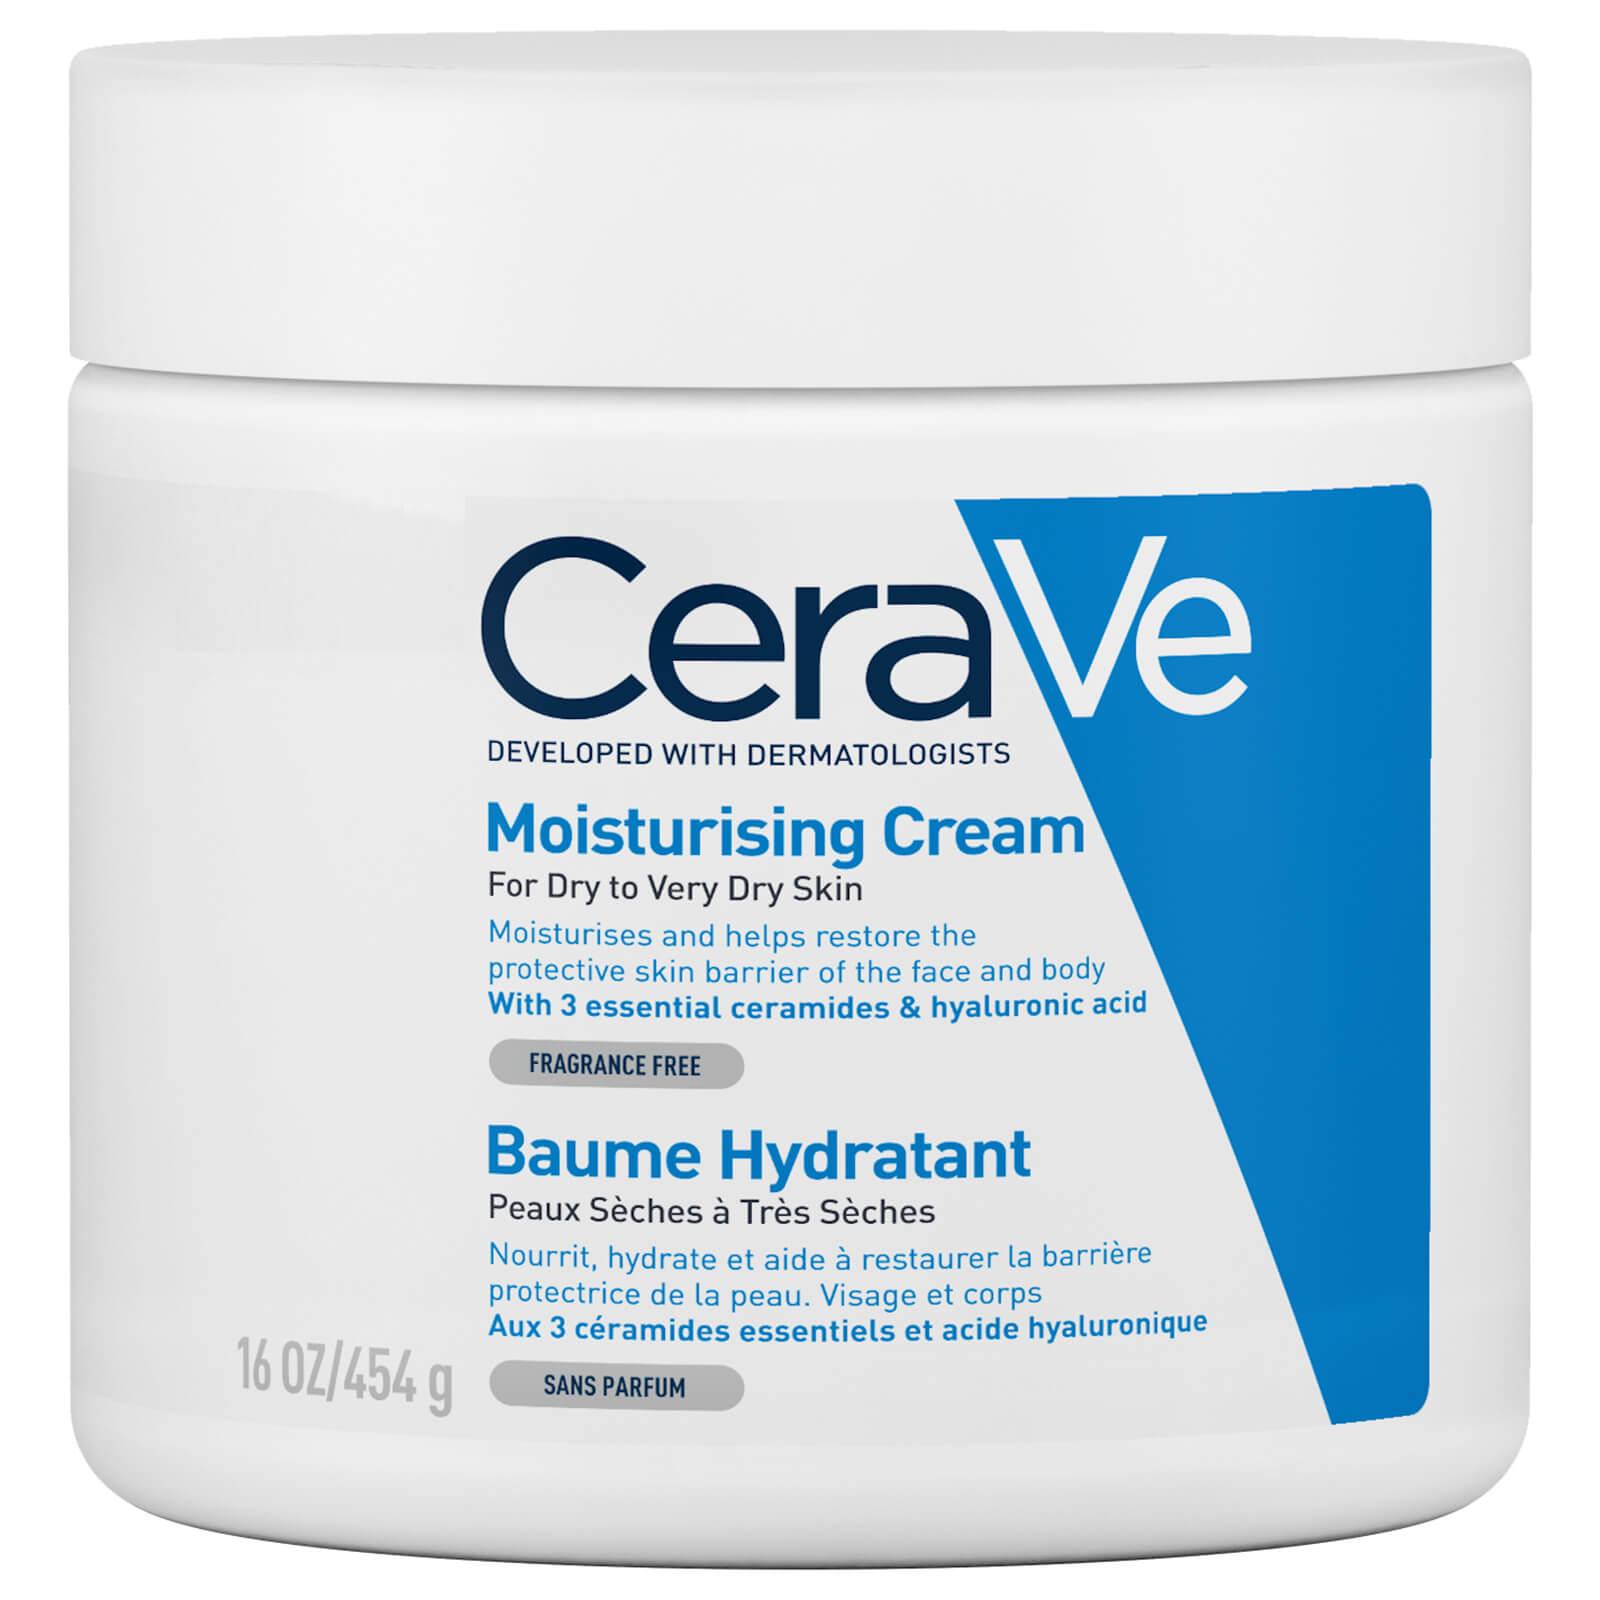 Image of CeraVe crema idratante (454 g)